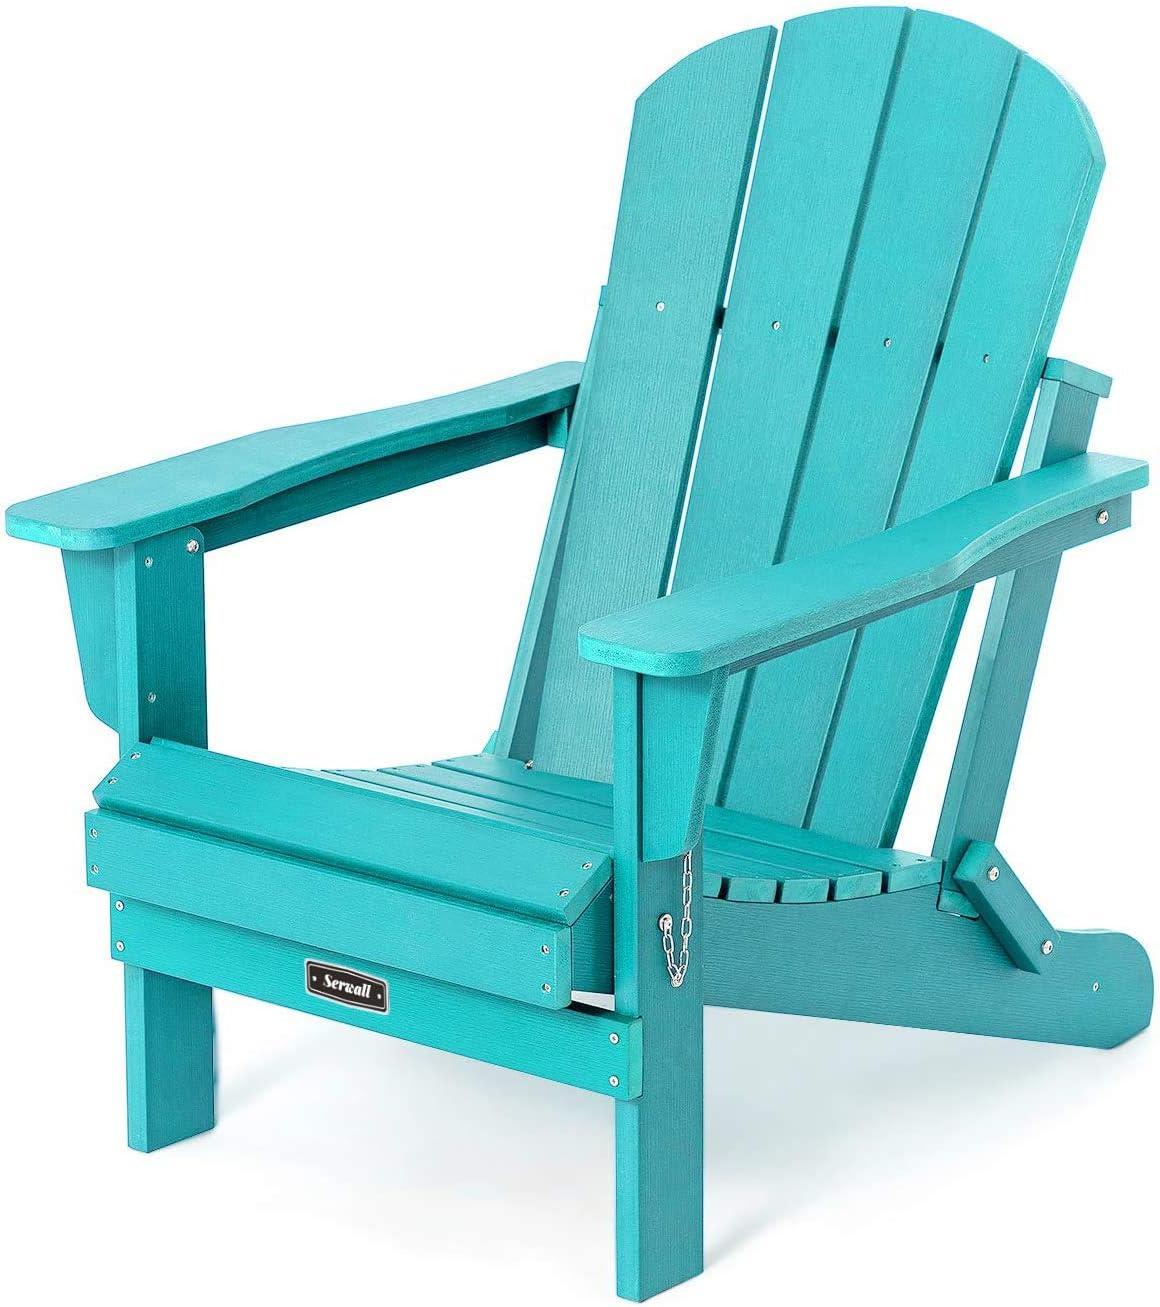 Folding Adirondack Chair Patio Chair Lawn Chair Outdoor Chairs Painted Adirondack Chairs Weather Resistant- Aruba Blue